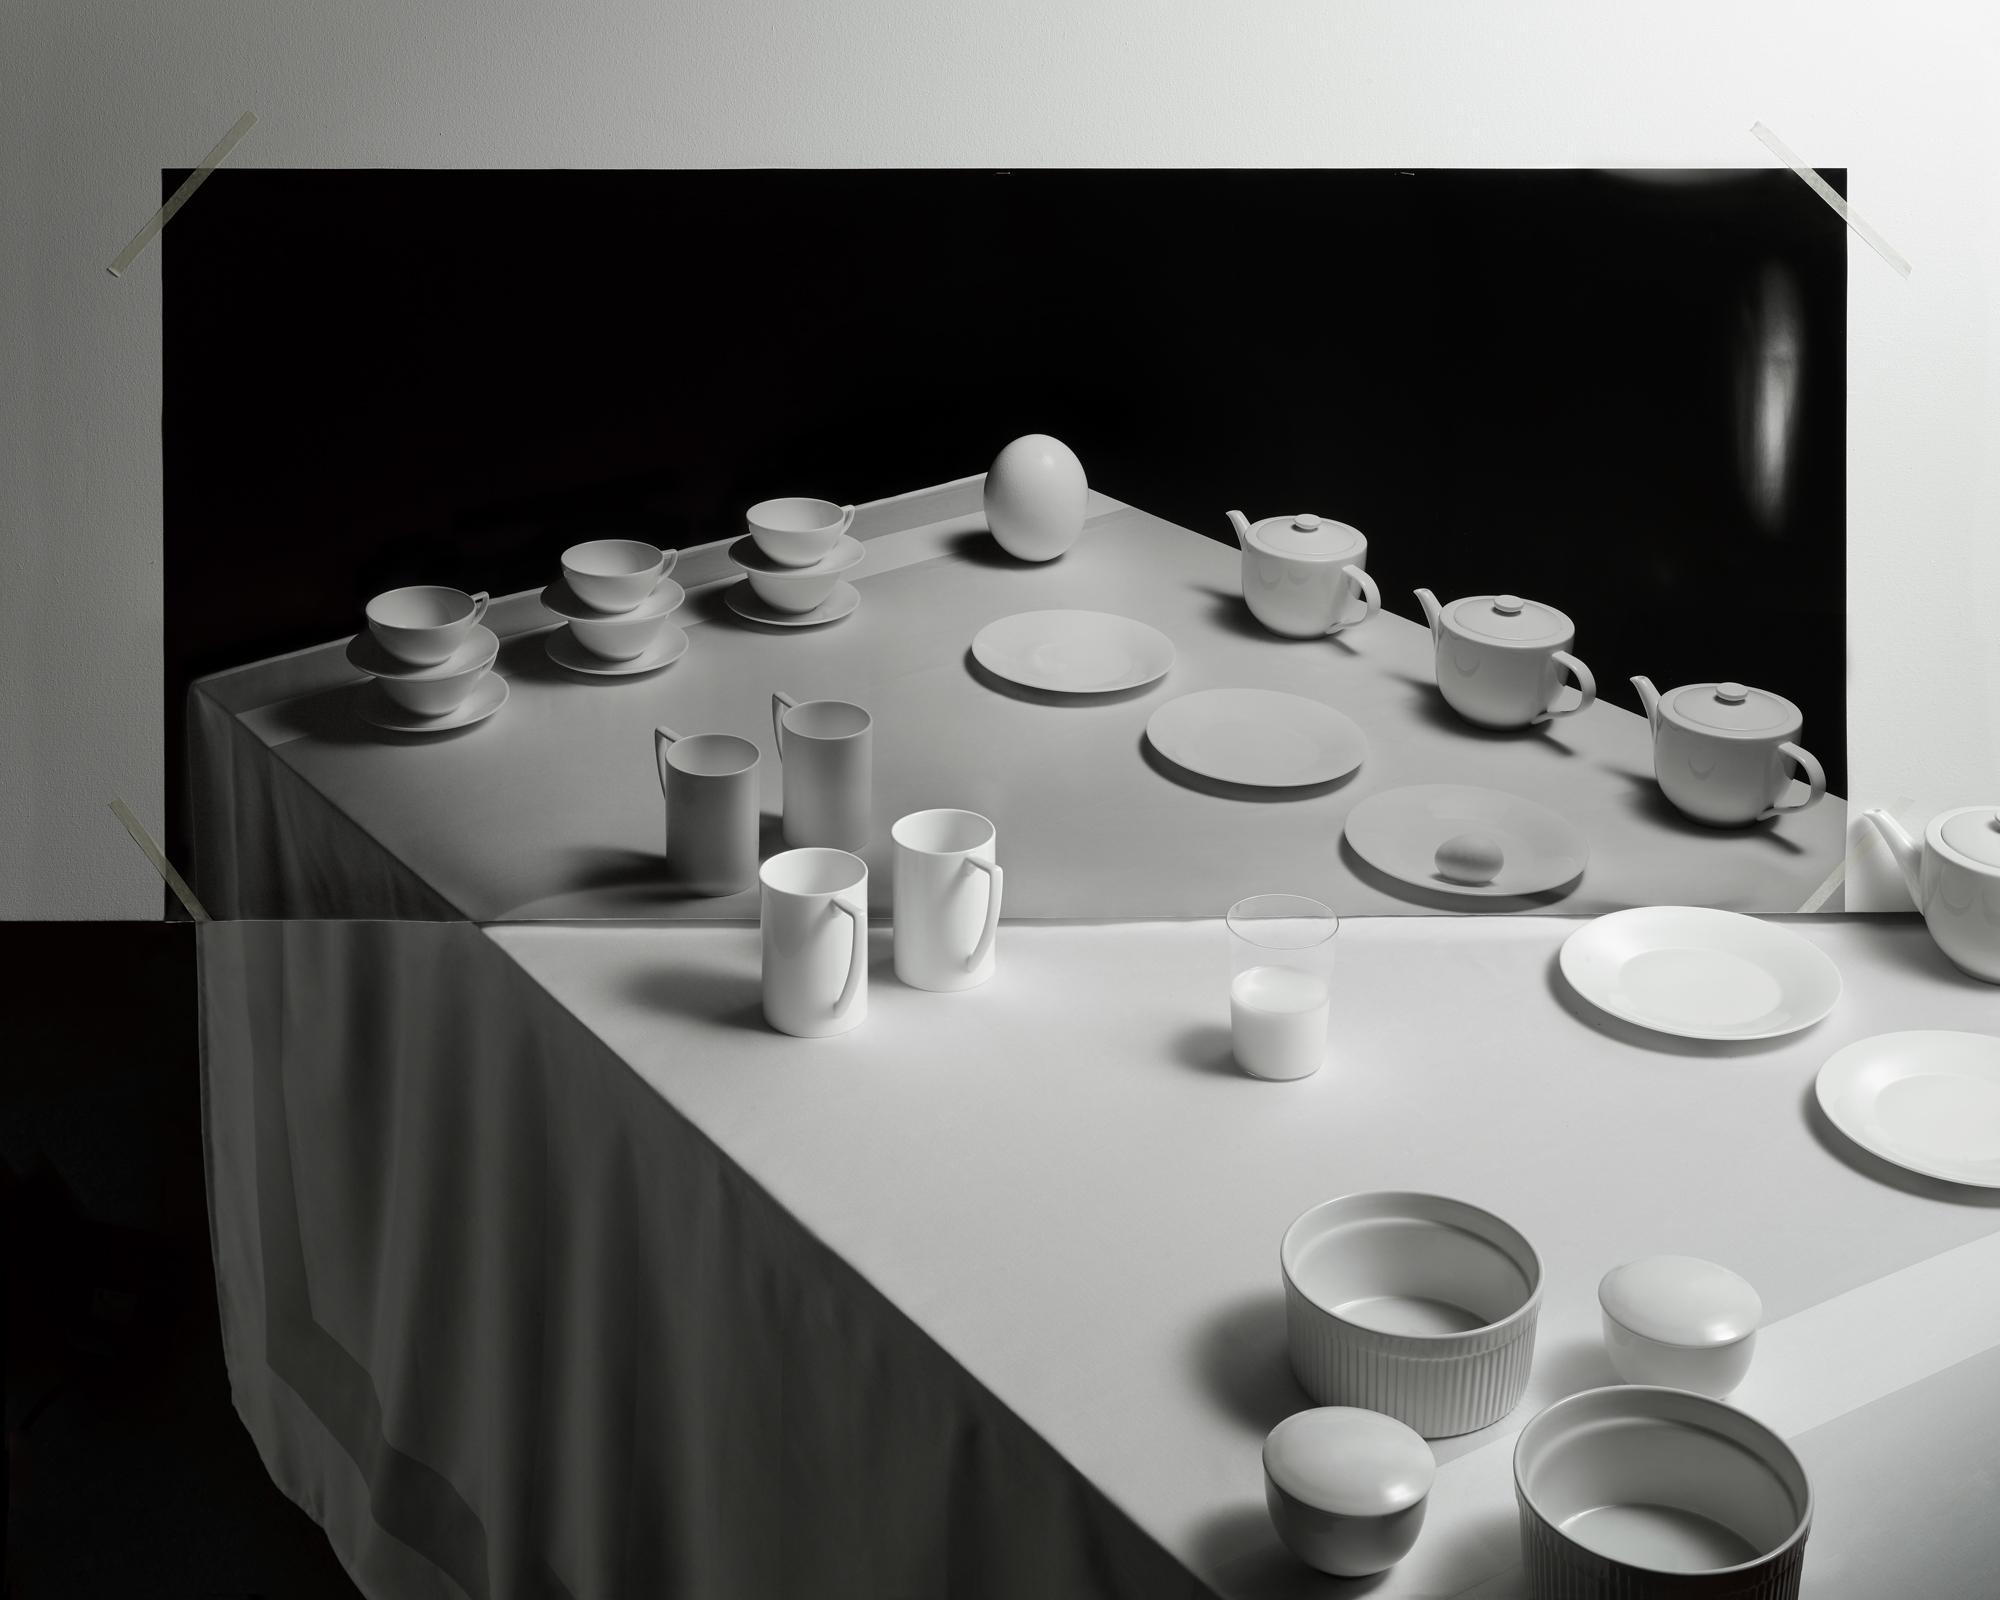 Tables_01_FINAL.jpg